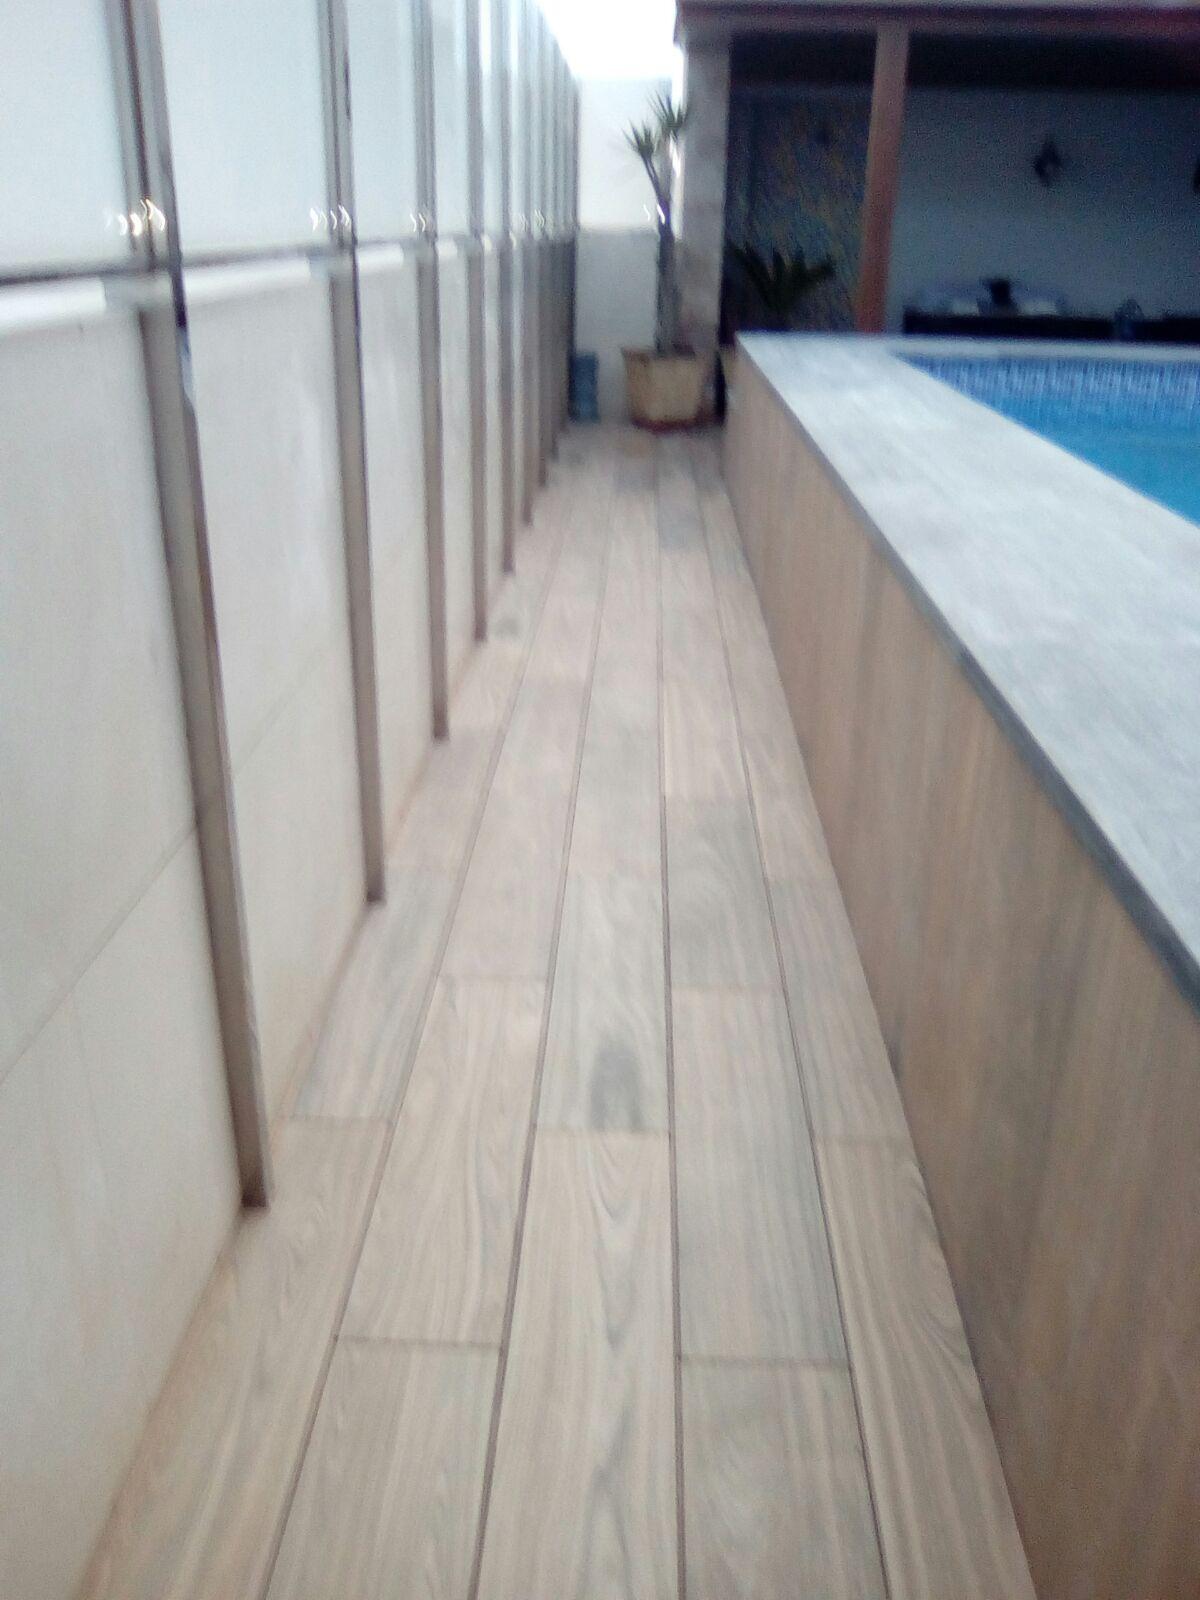 reforma alicatado piscina torrevieja orihuela benejuzar